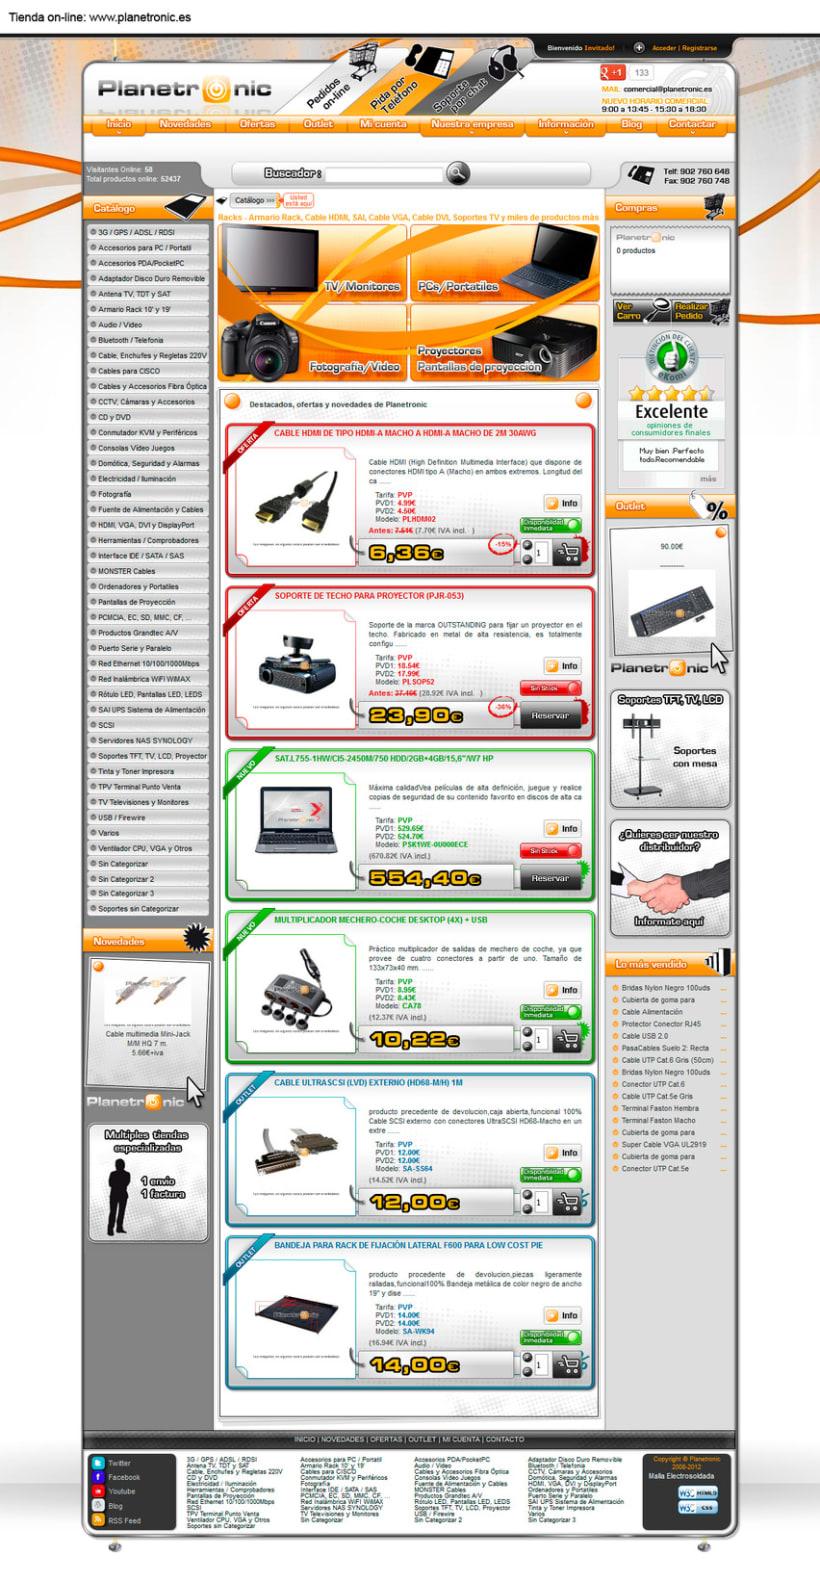 Otras tiendas on-line realizadas con oscommerce 3